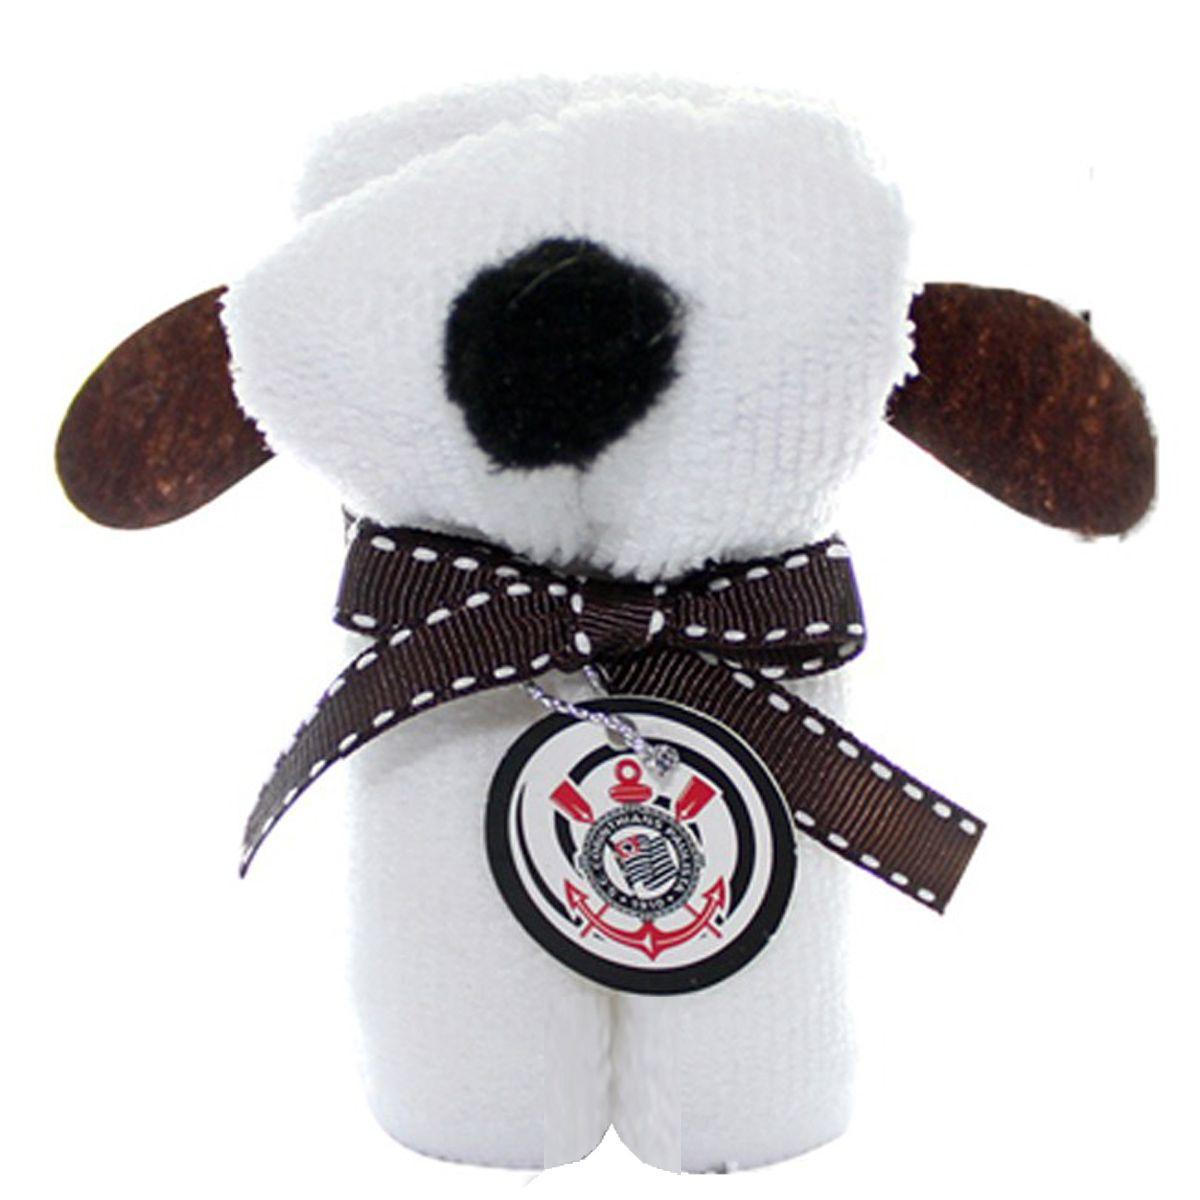 Lata Cofre + Toalha Cachorro do Corinthians - P056